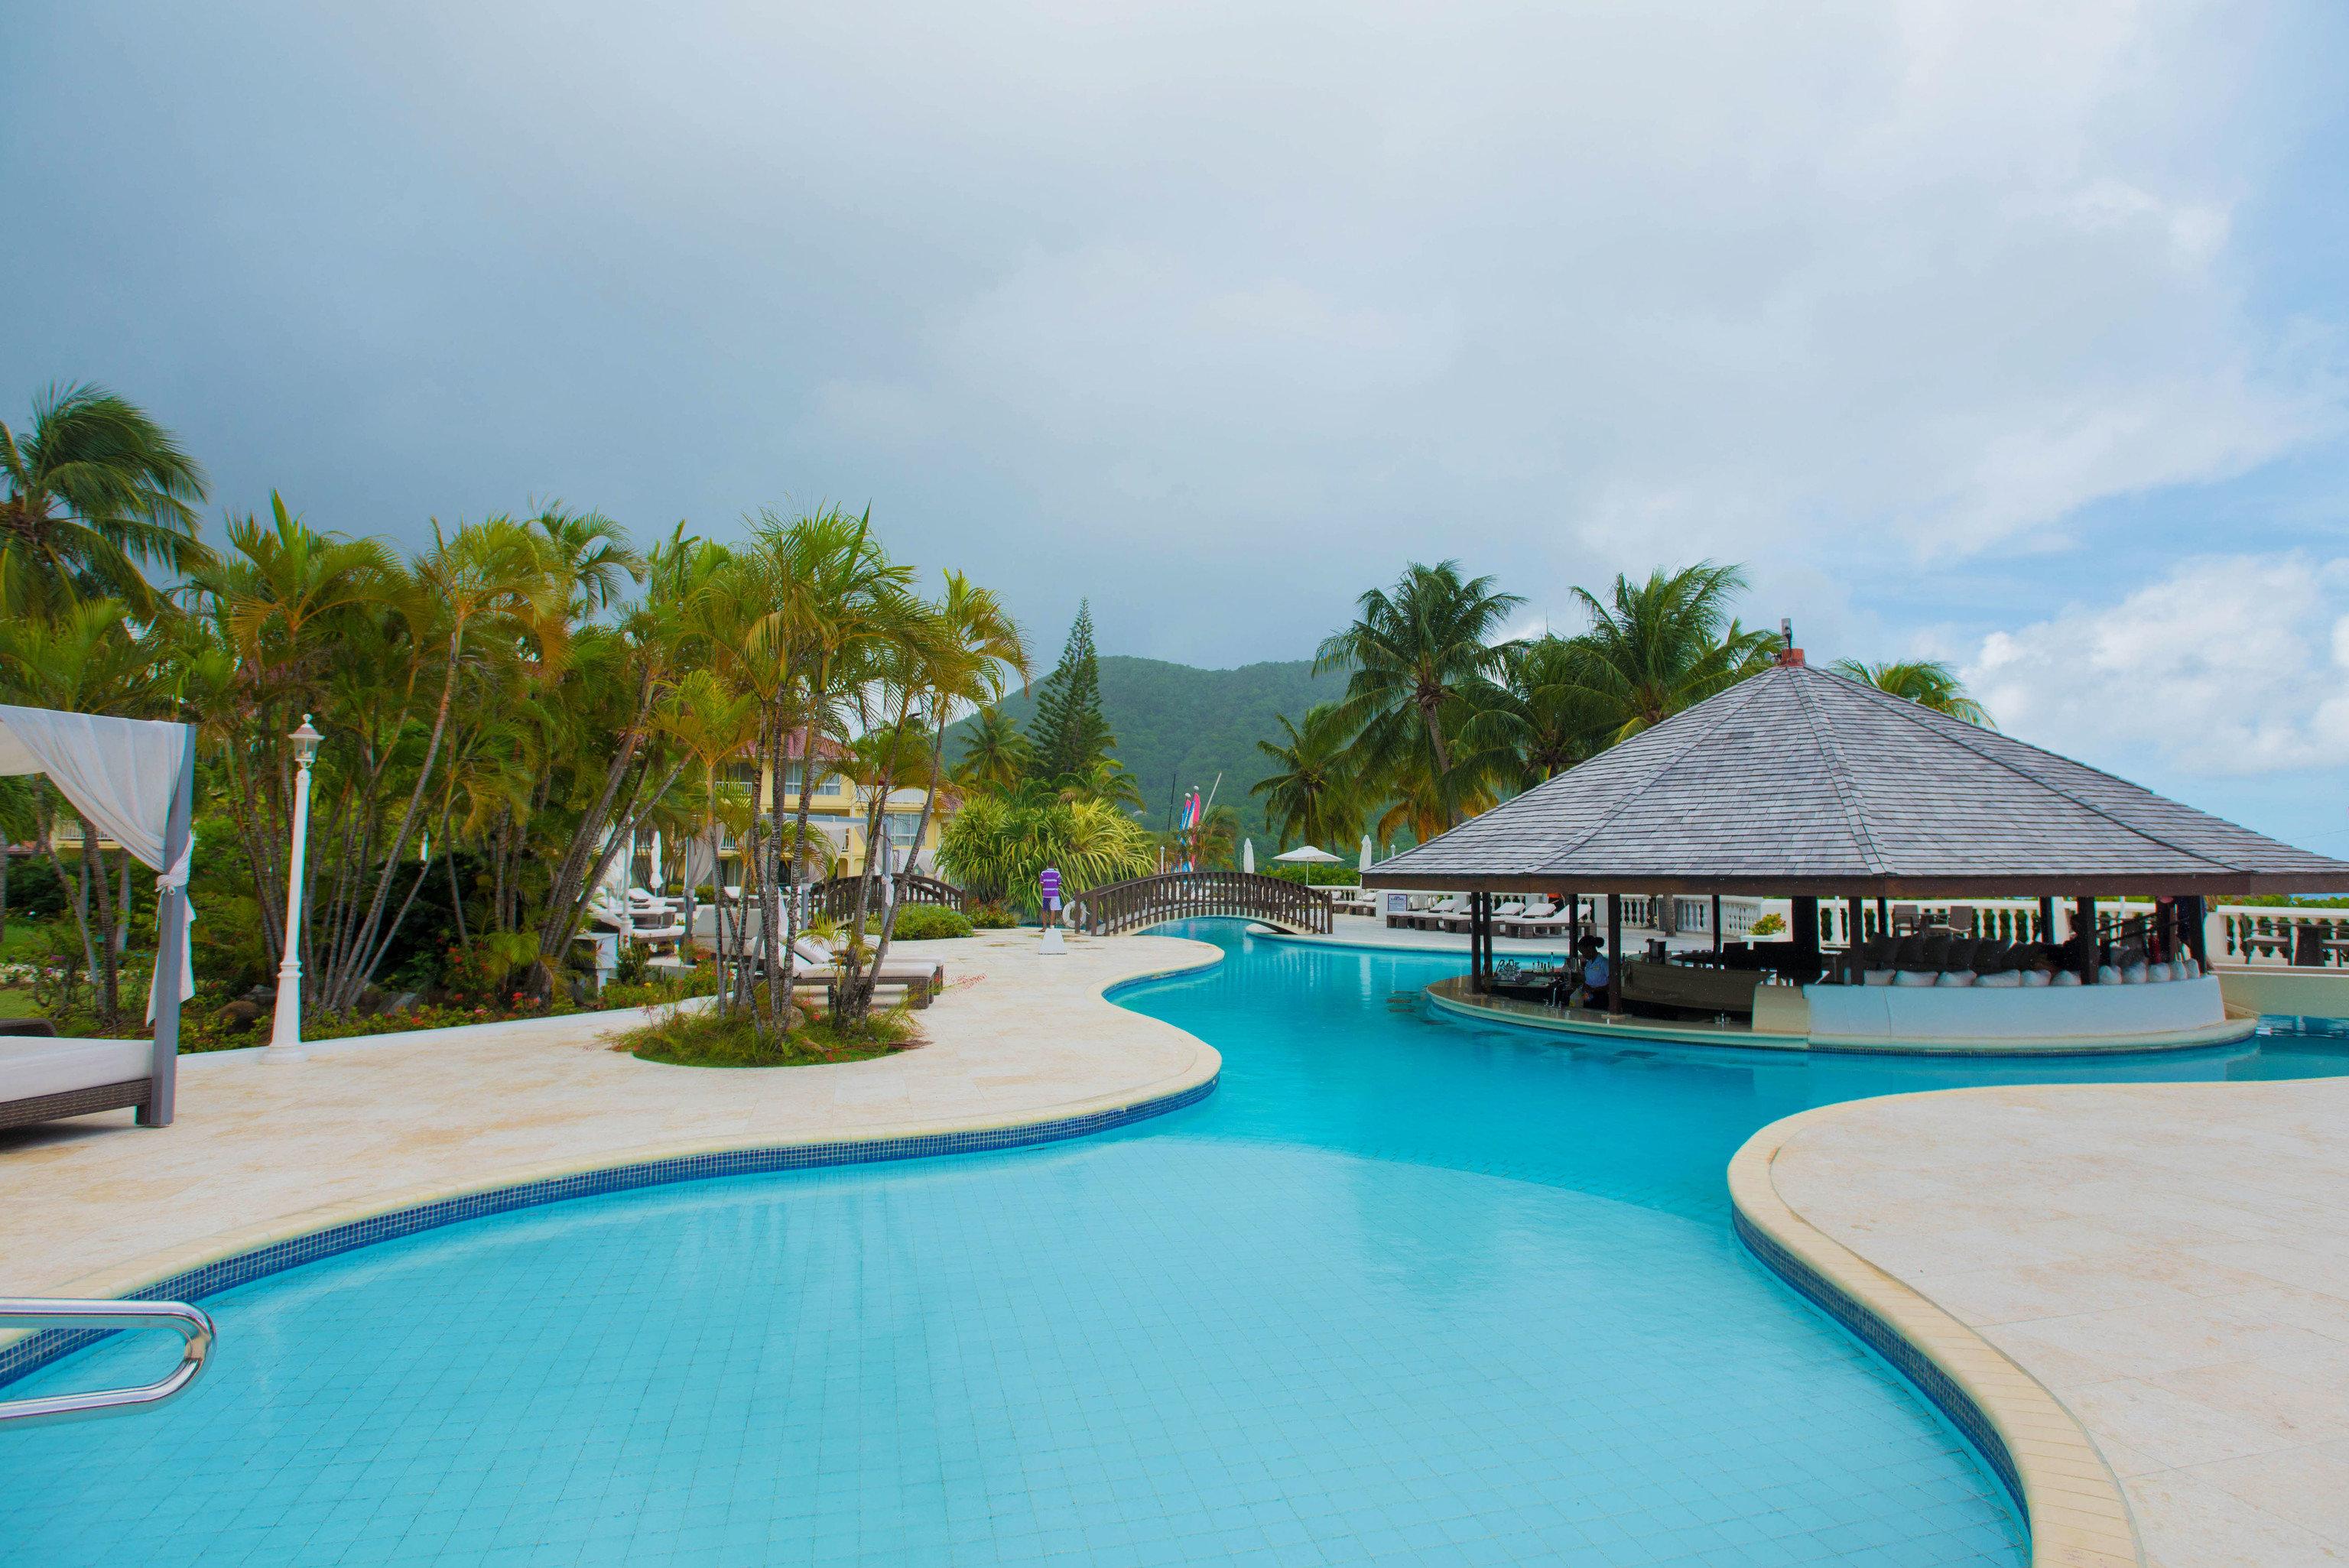 sky water swimming pool property leisure Resort Pool caribbean resort town Lagoon Water park Villa swimming empty